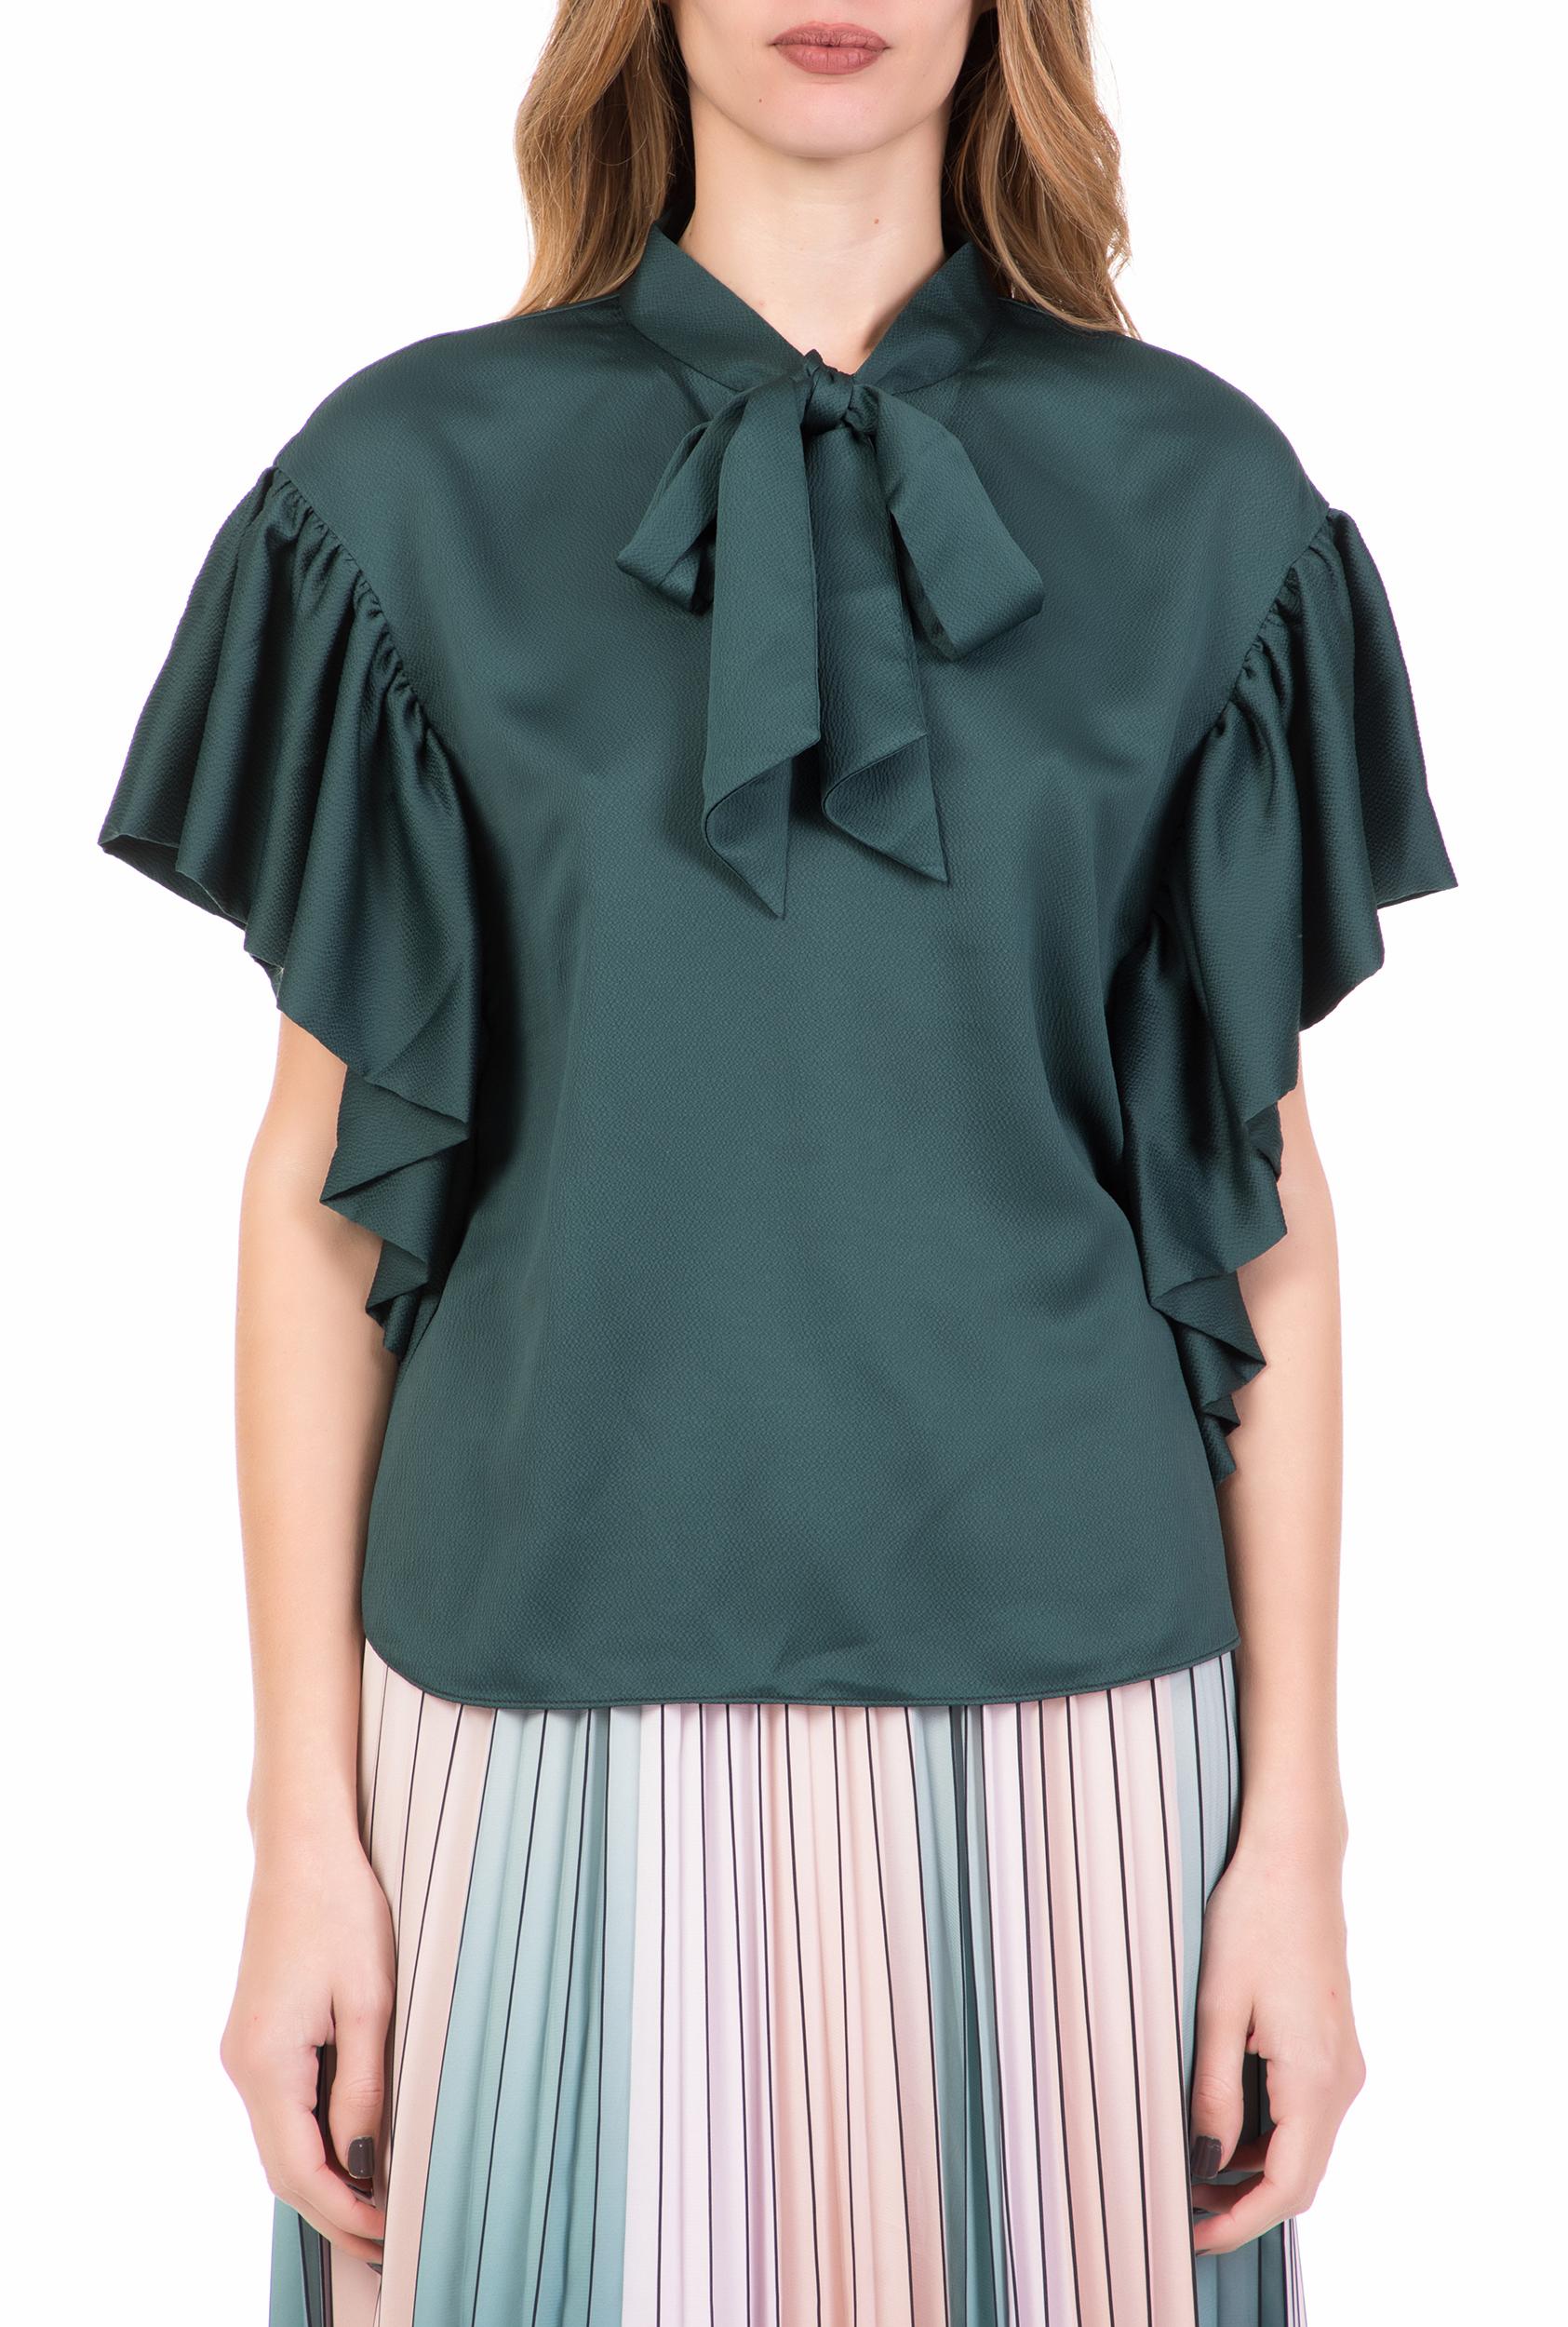 TED BAKER - Γυναικεία πουκαμίσα TED BAKER ROBYNN πράσινη